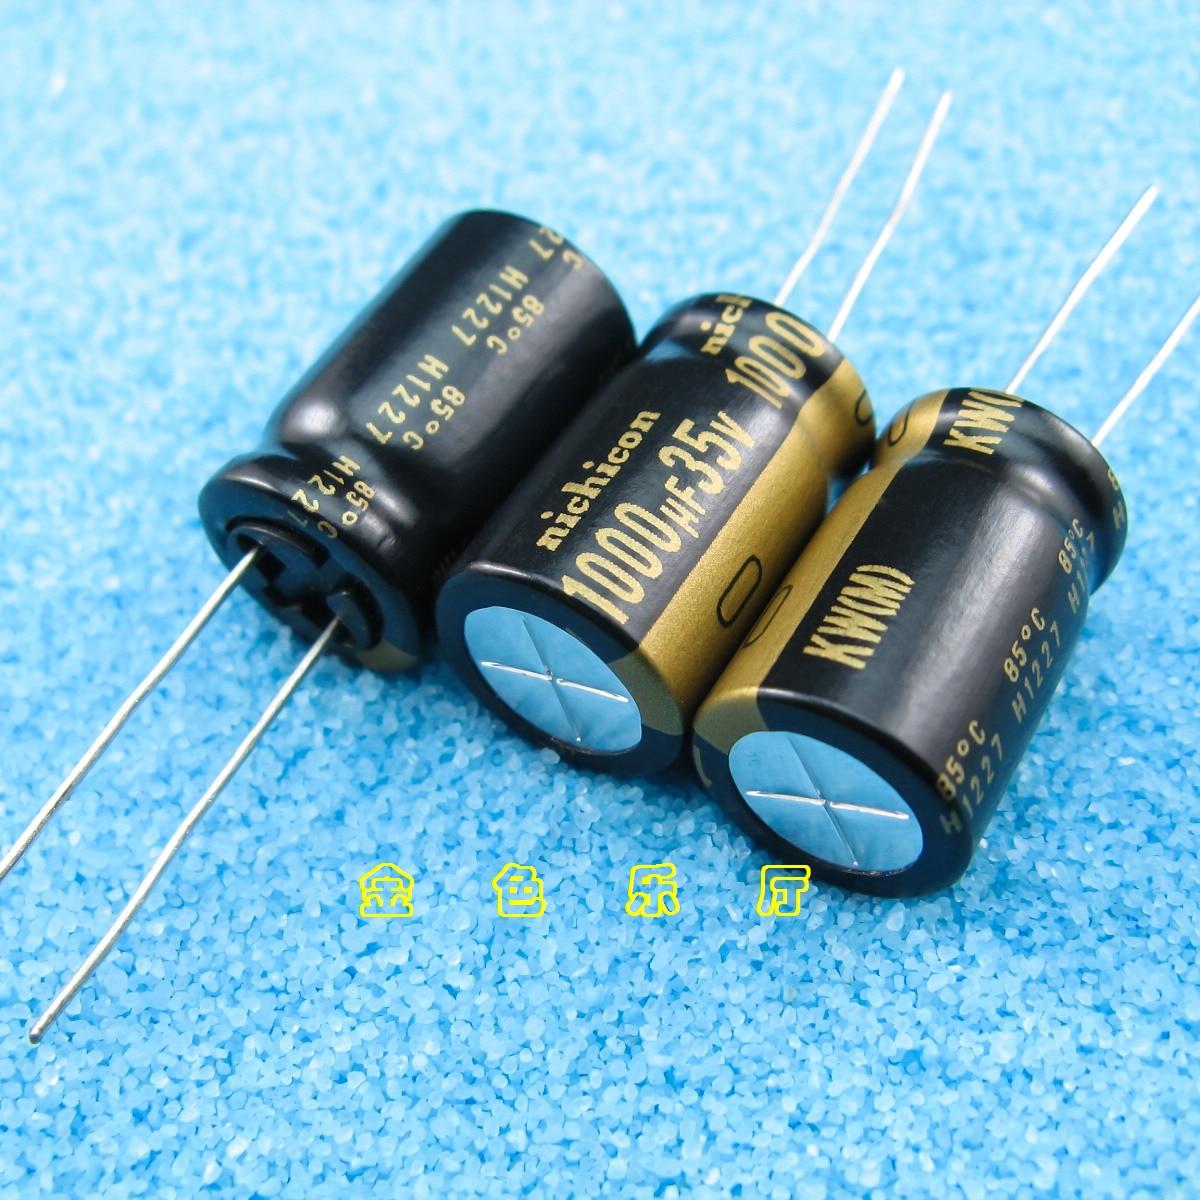 10pcs NICHICON KW 35V1000UF 12.5X20MM Audio Electrolytic Capacitor 1000uF/35v Kw 85 Degrees FW Upgrade Version 1000UF 35V